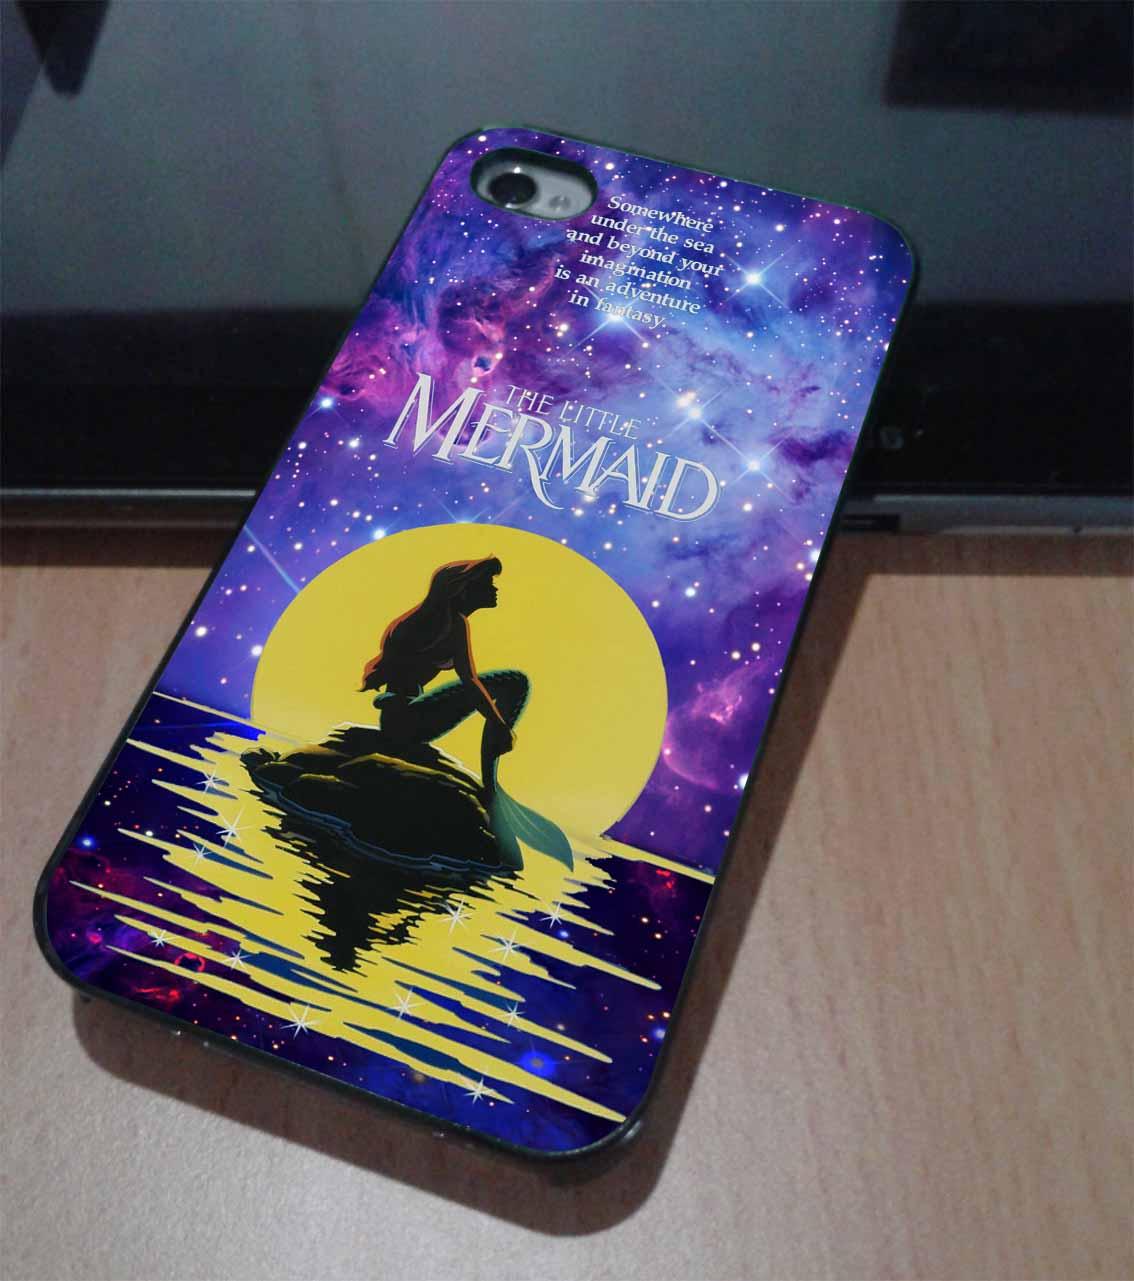 In the moonlight nebula space ariel the little mermaid